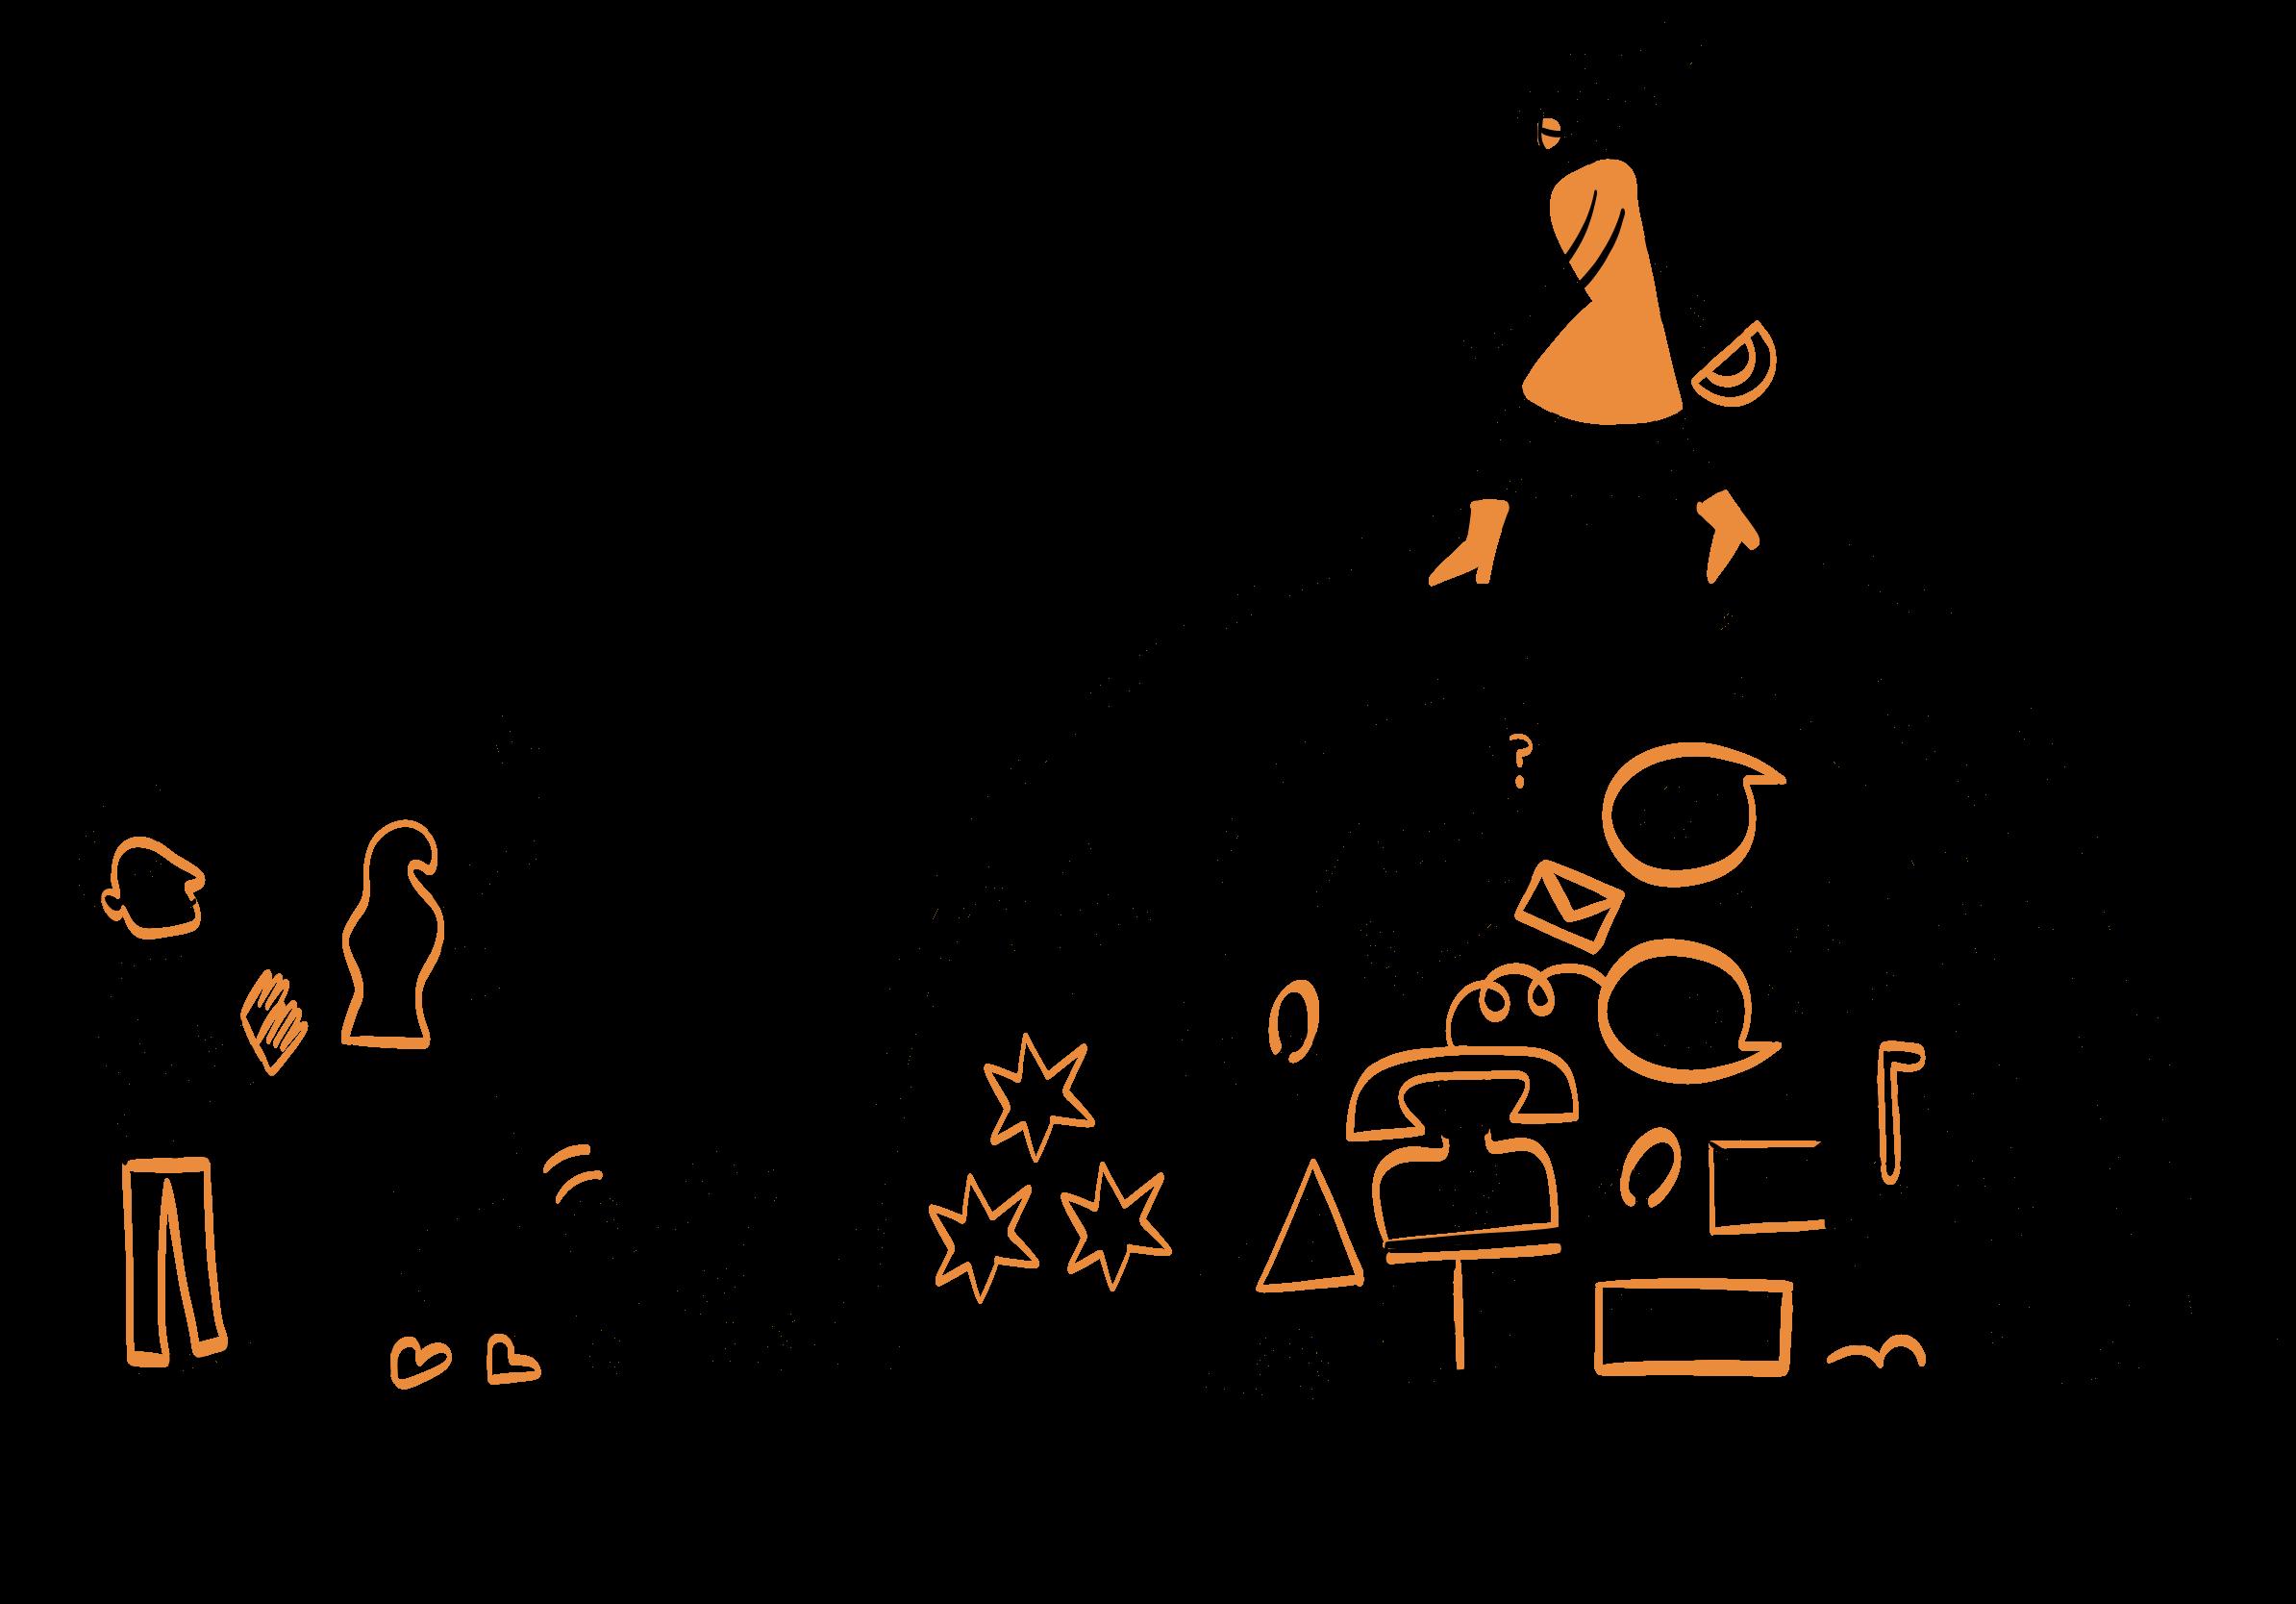 [foundkit]-[web illustration]-[sketches] 4